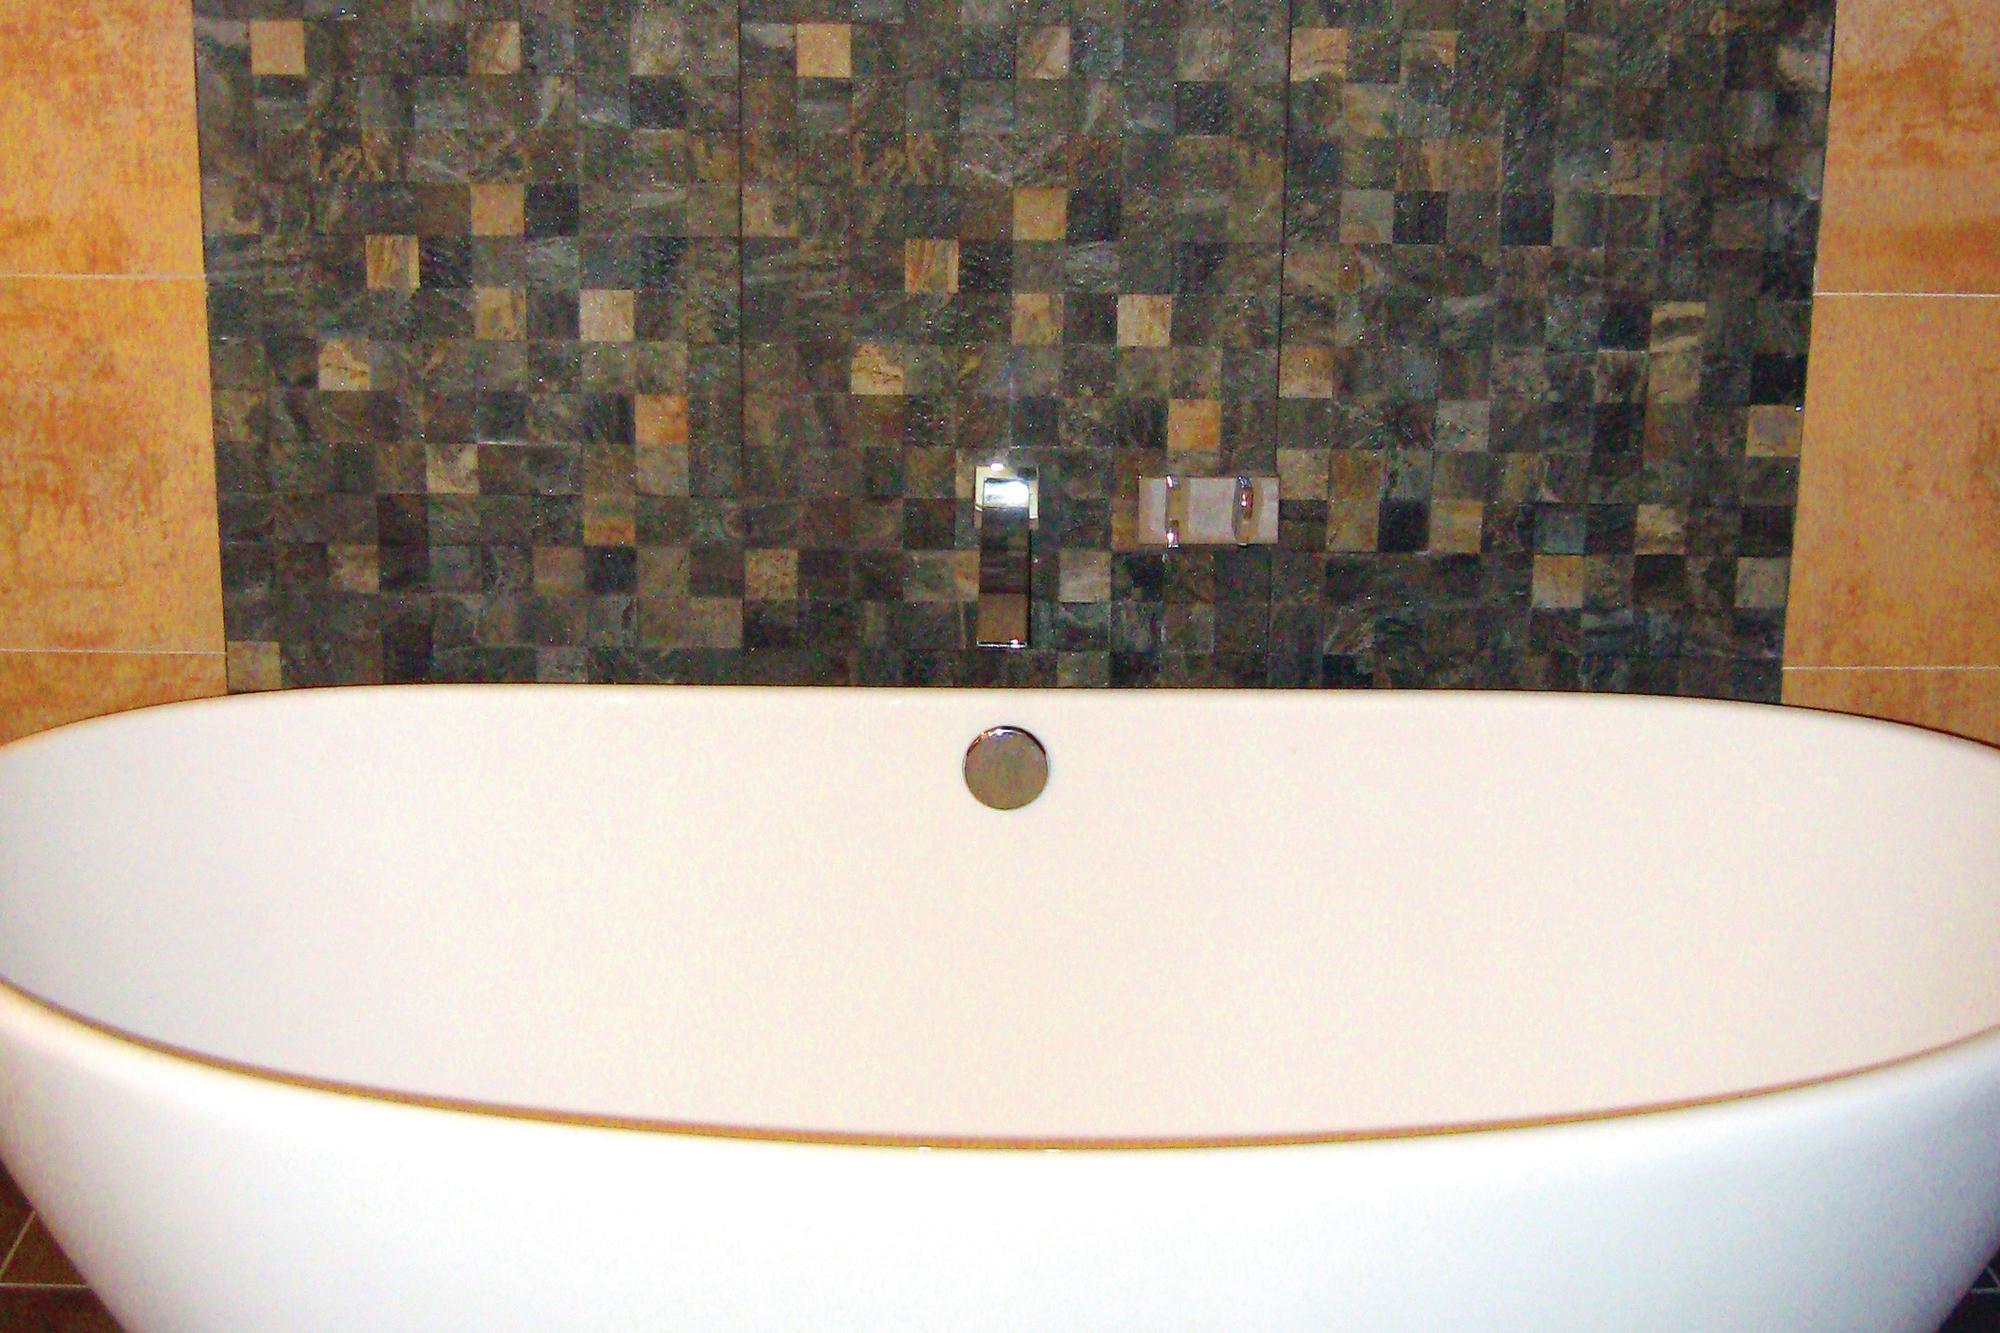 A Textured Backsplash Anchors A Freestanding Tub Builder Magazine Design Bath Tubs Washington Arlington Alexandria Dc Va Md Wv Mabel